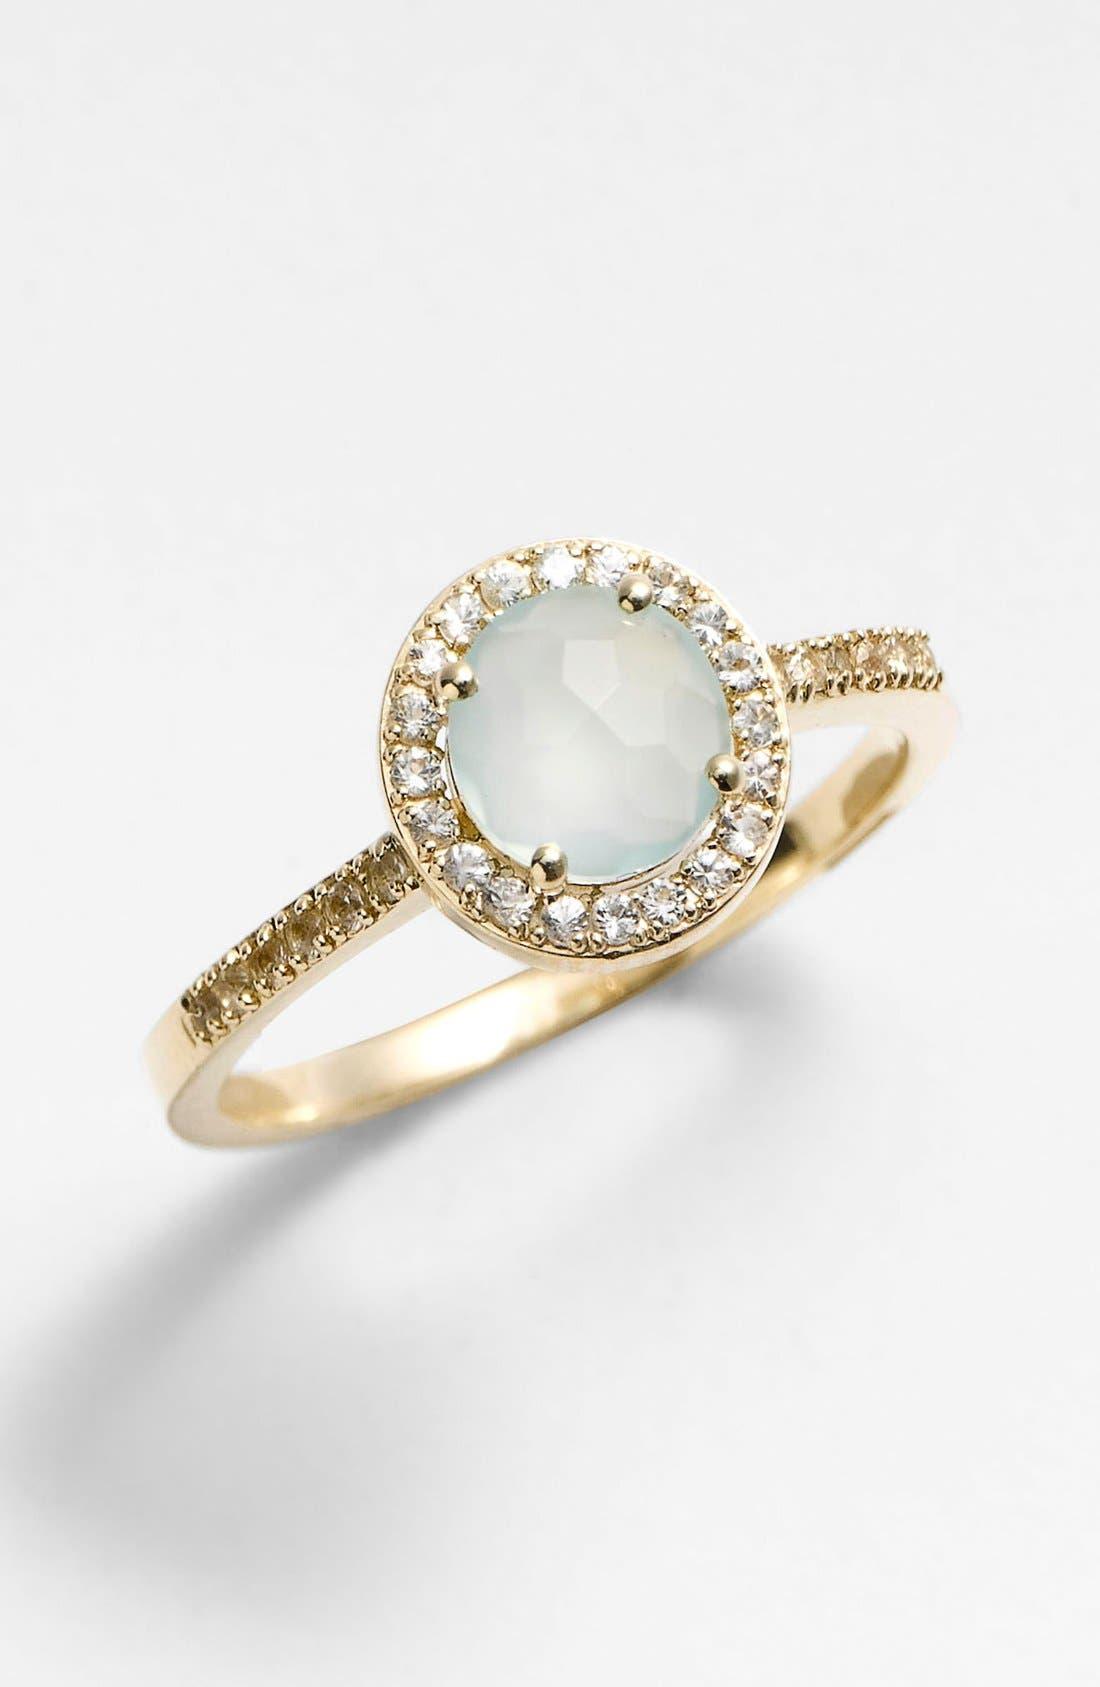 Alternate Image 1 Selected - KALAN by Suzanne Kalan Round Bezel Ring